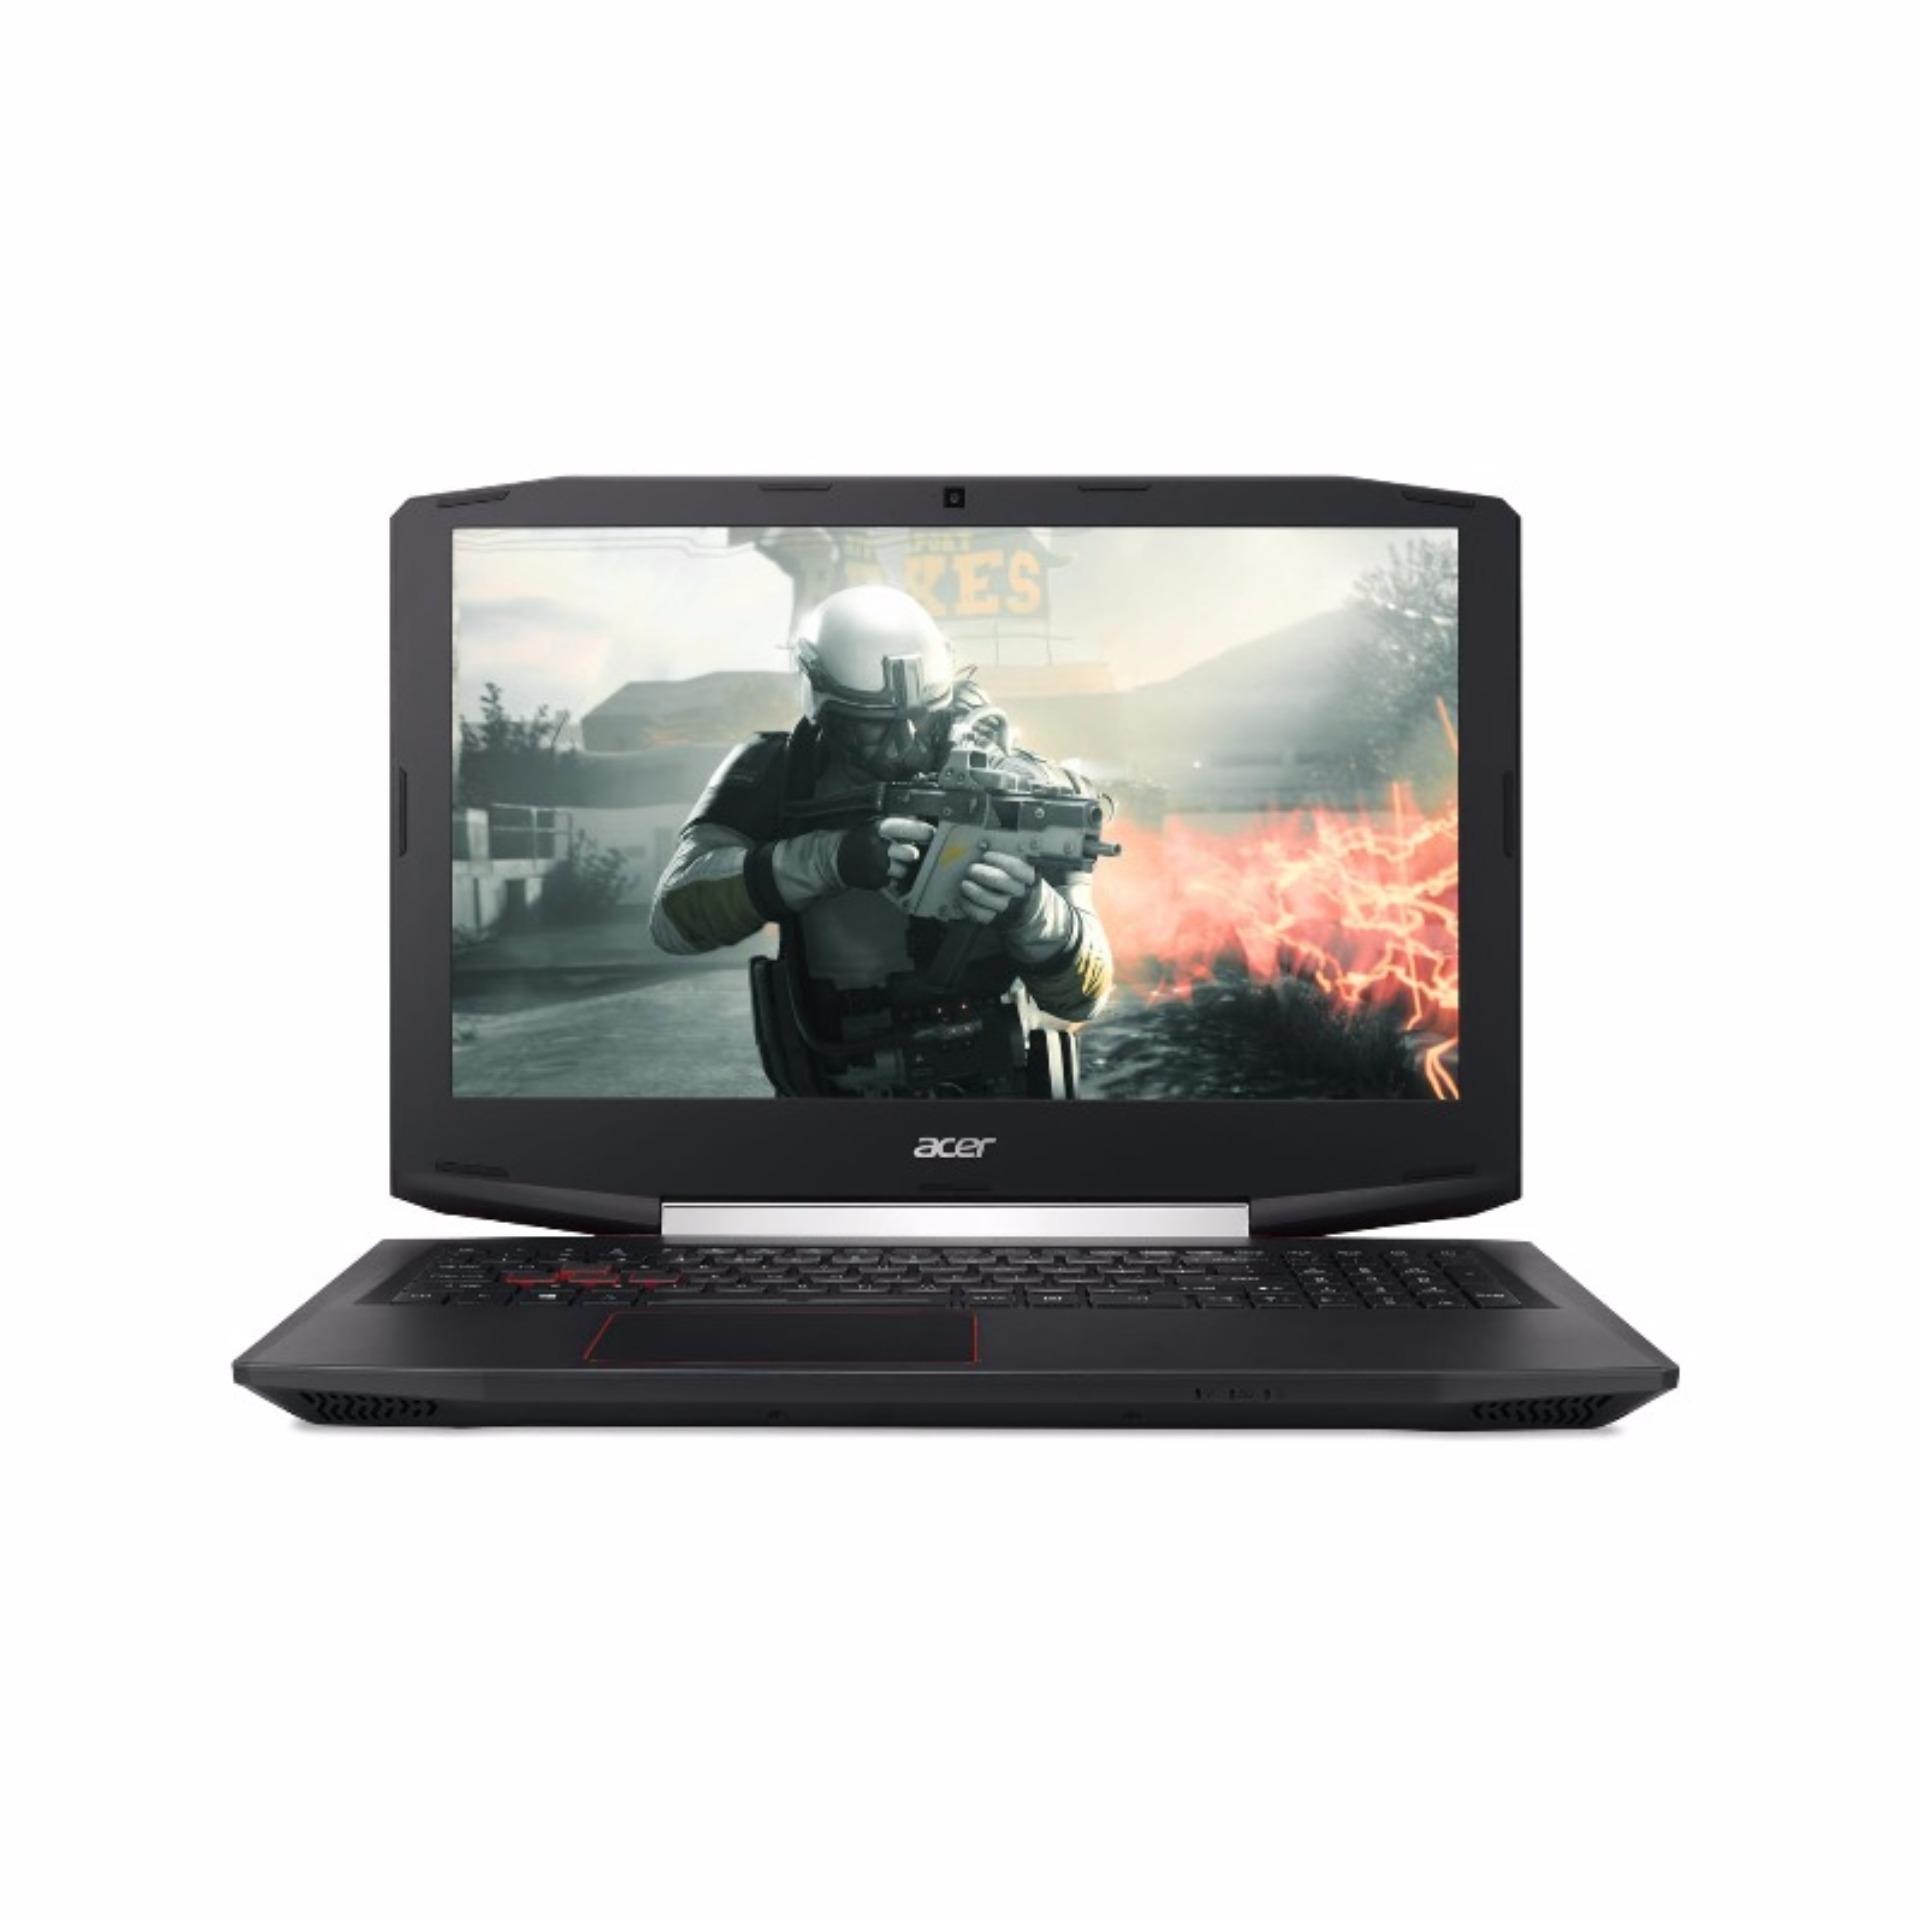 Laptop Gaming Acer E5 475g 541u Core I5 7200u Kabylake 4gb 1000gb Aspire Gr Intel Nvidia Geforce Gtx1050ti Ddr5 Windows 10 Home Sl 64bit 156inch Fhd Matte Led